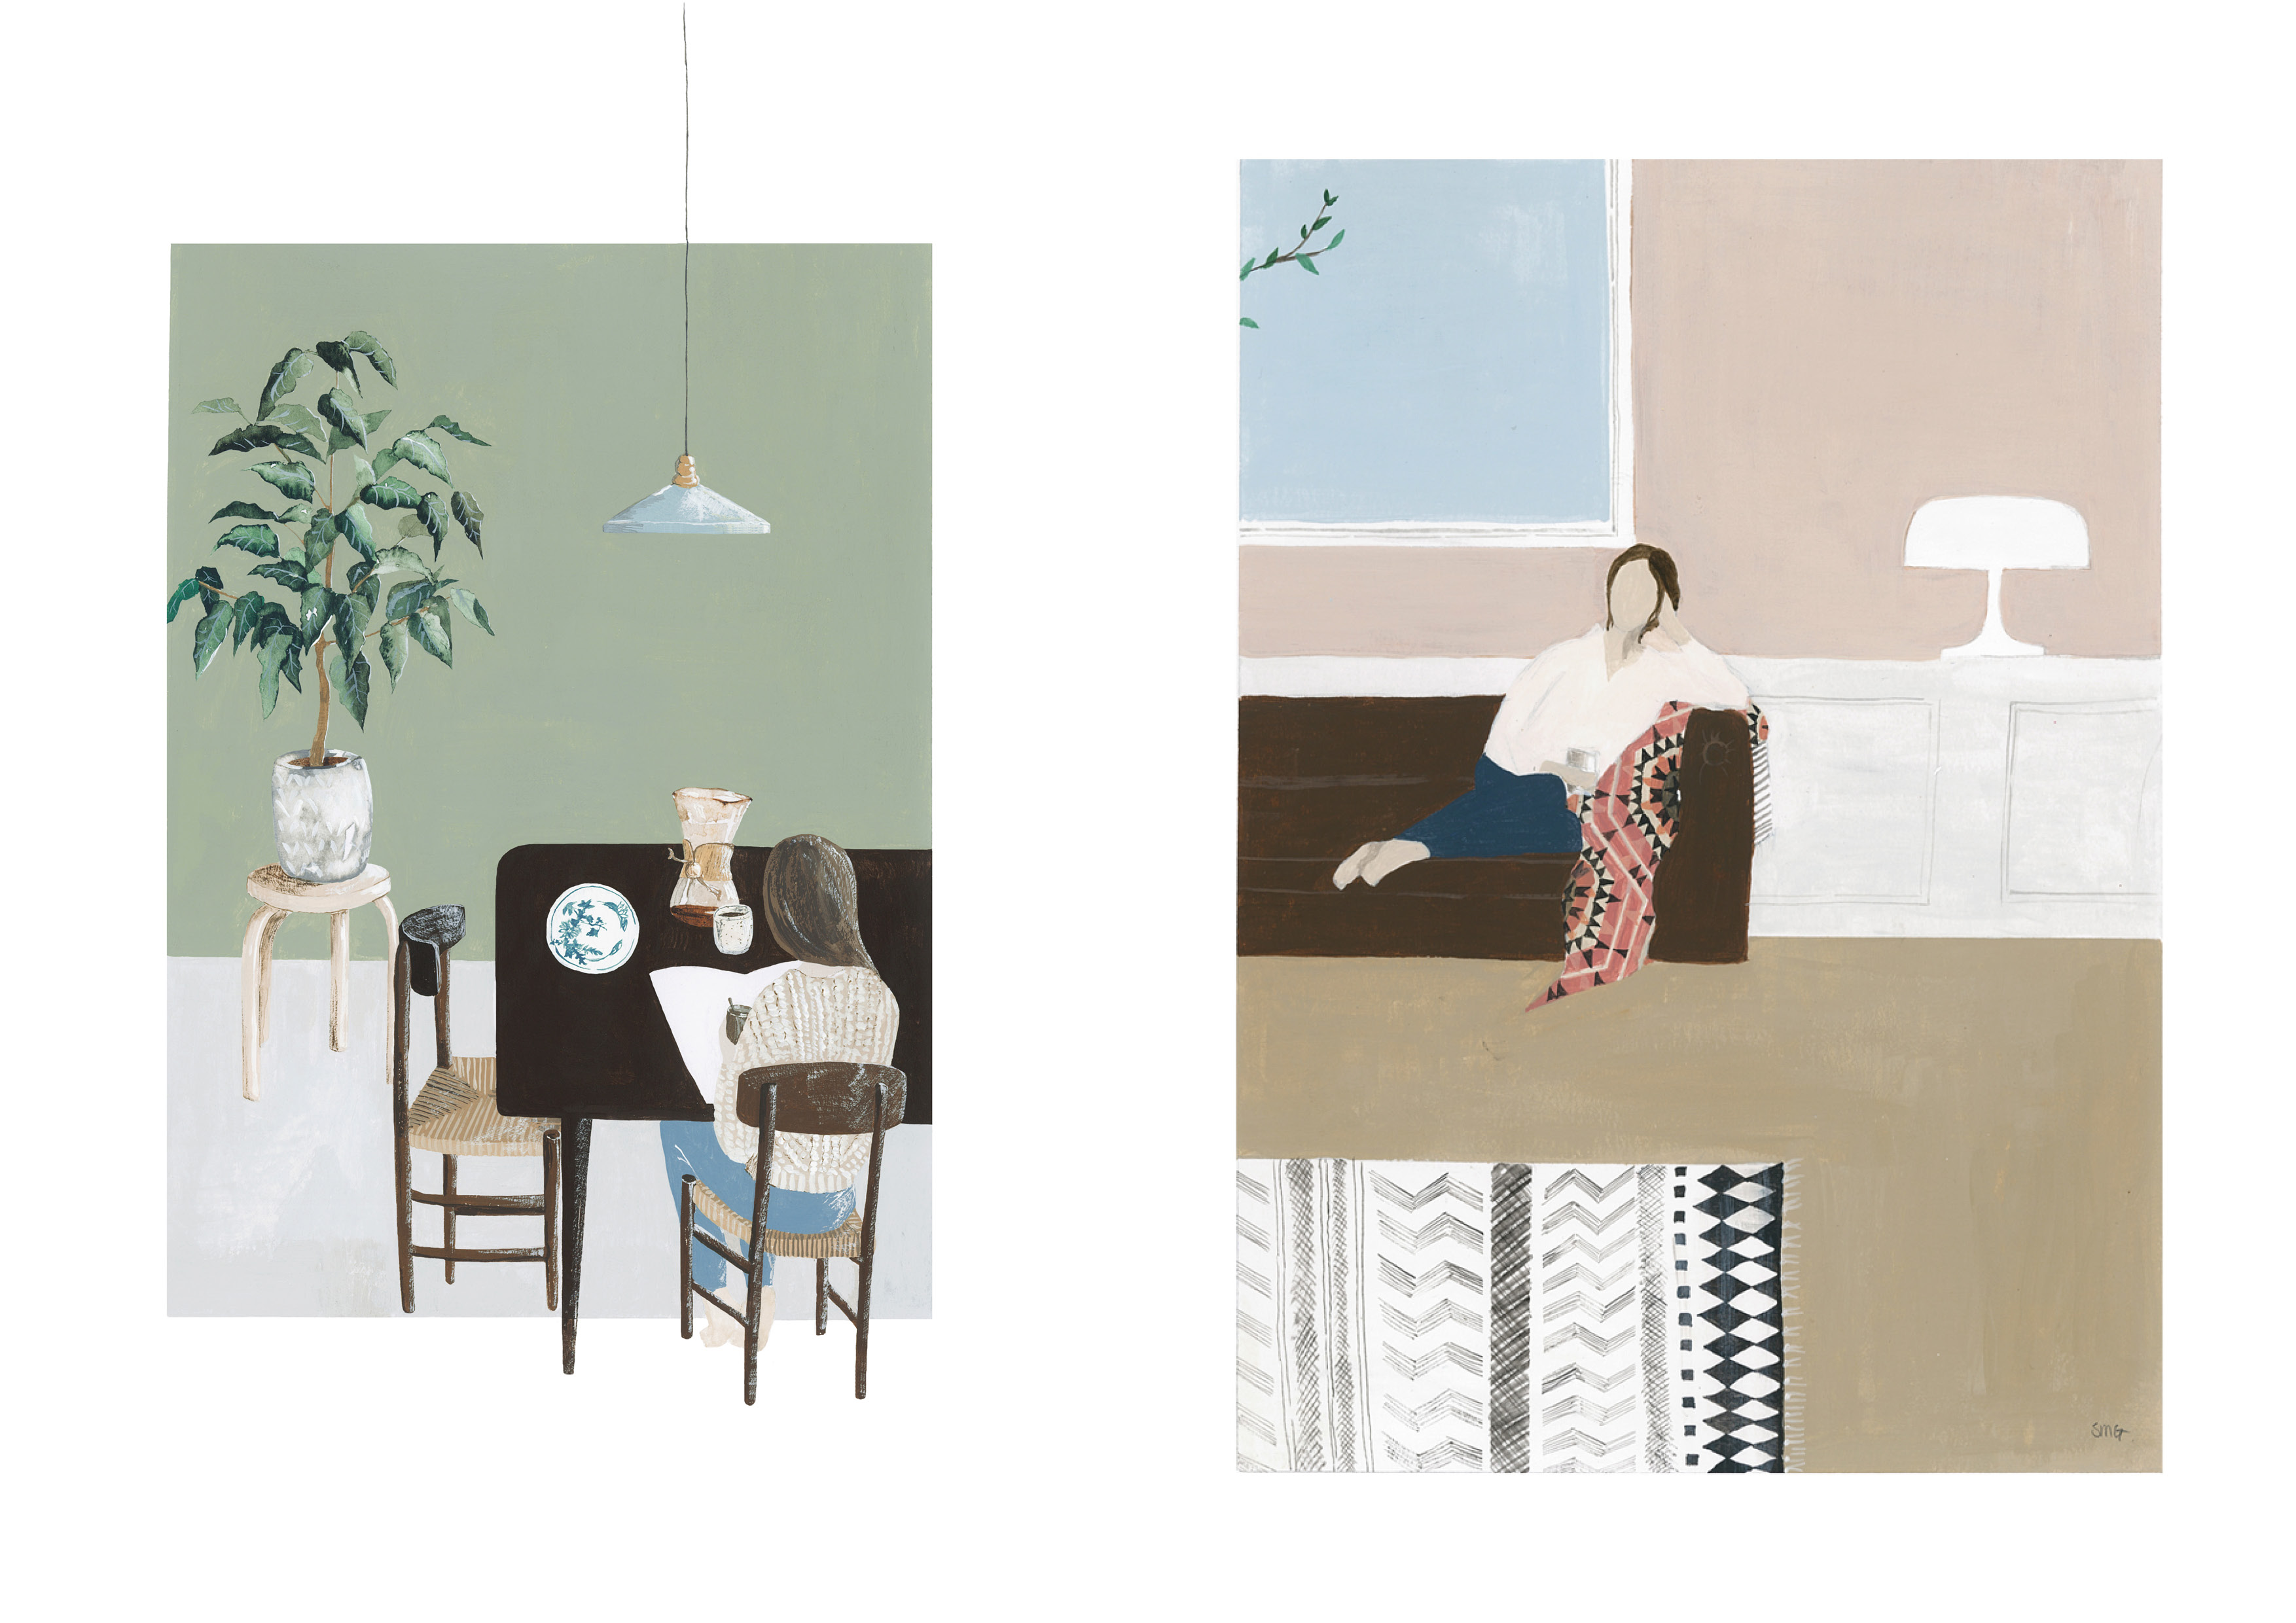 illustrations from Saar Manche